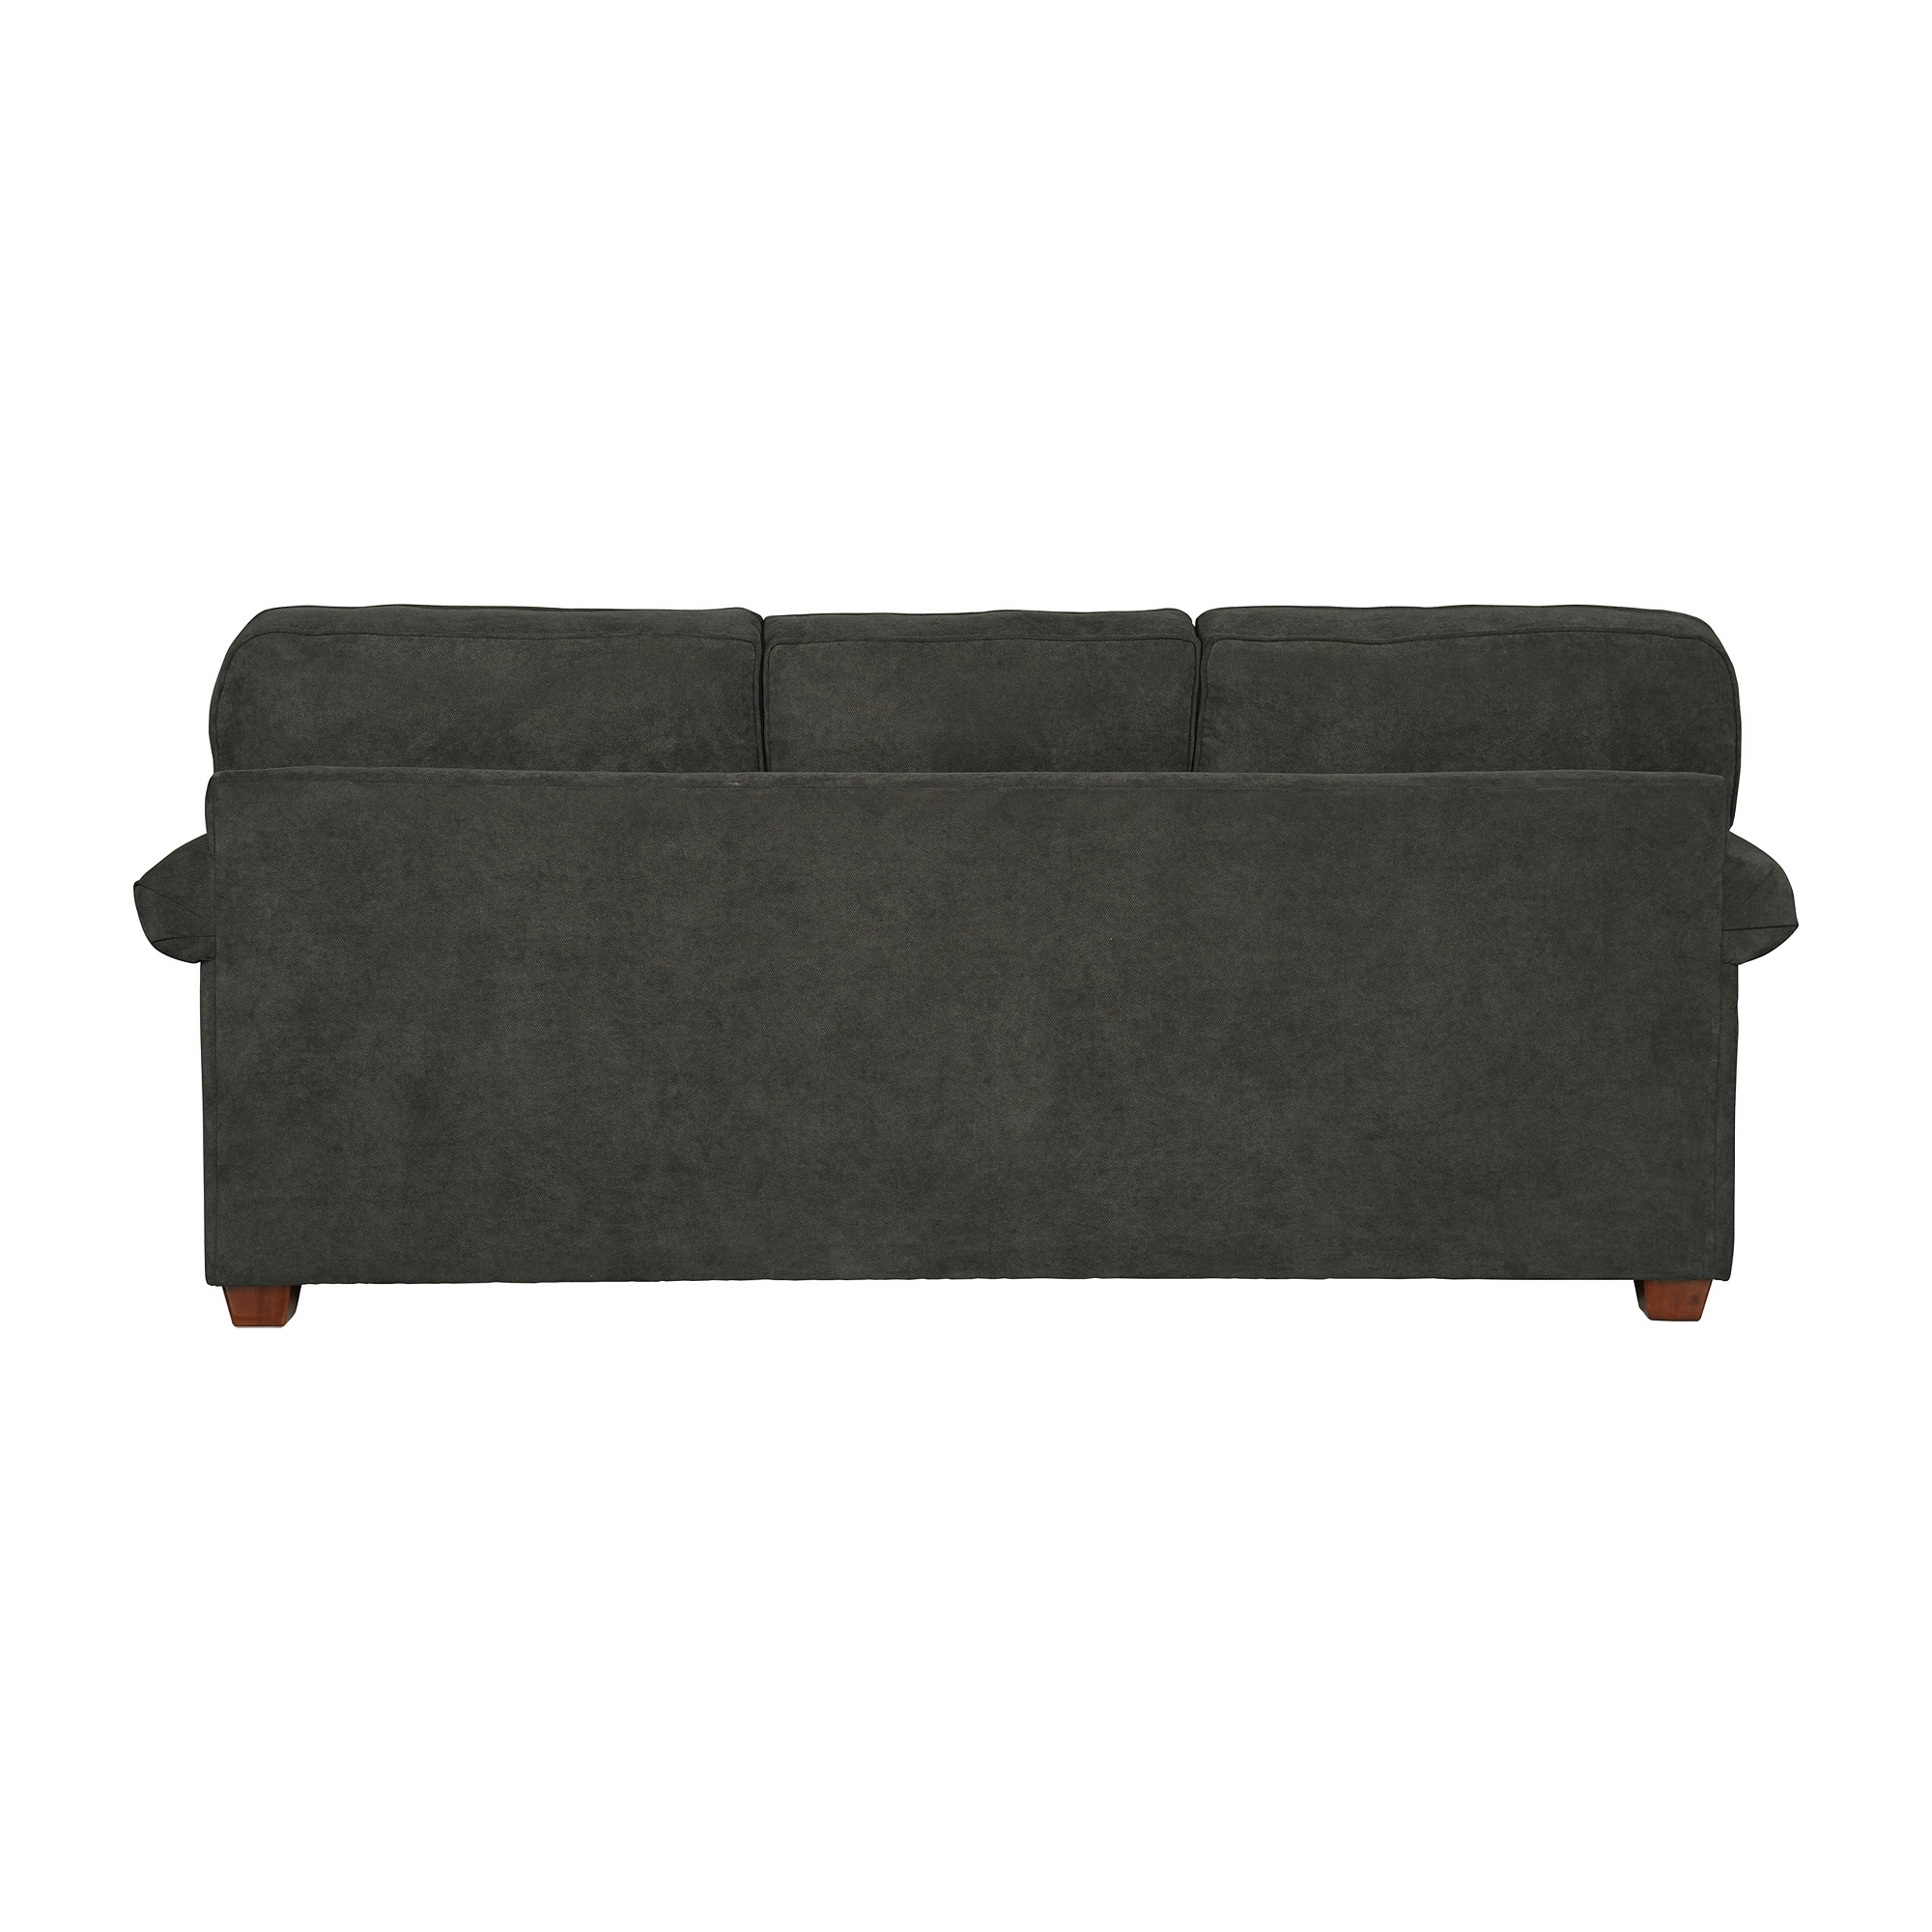 Superb Kara Sofa Ibusinesslaw Wood Chair Design Ideas Ibusinesslaworg